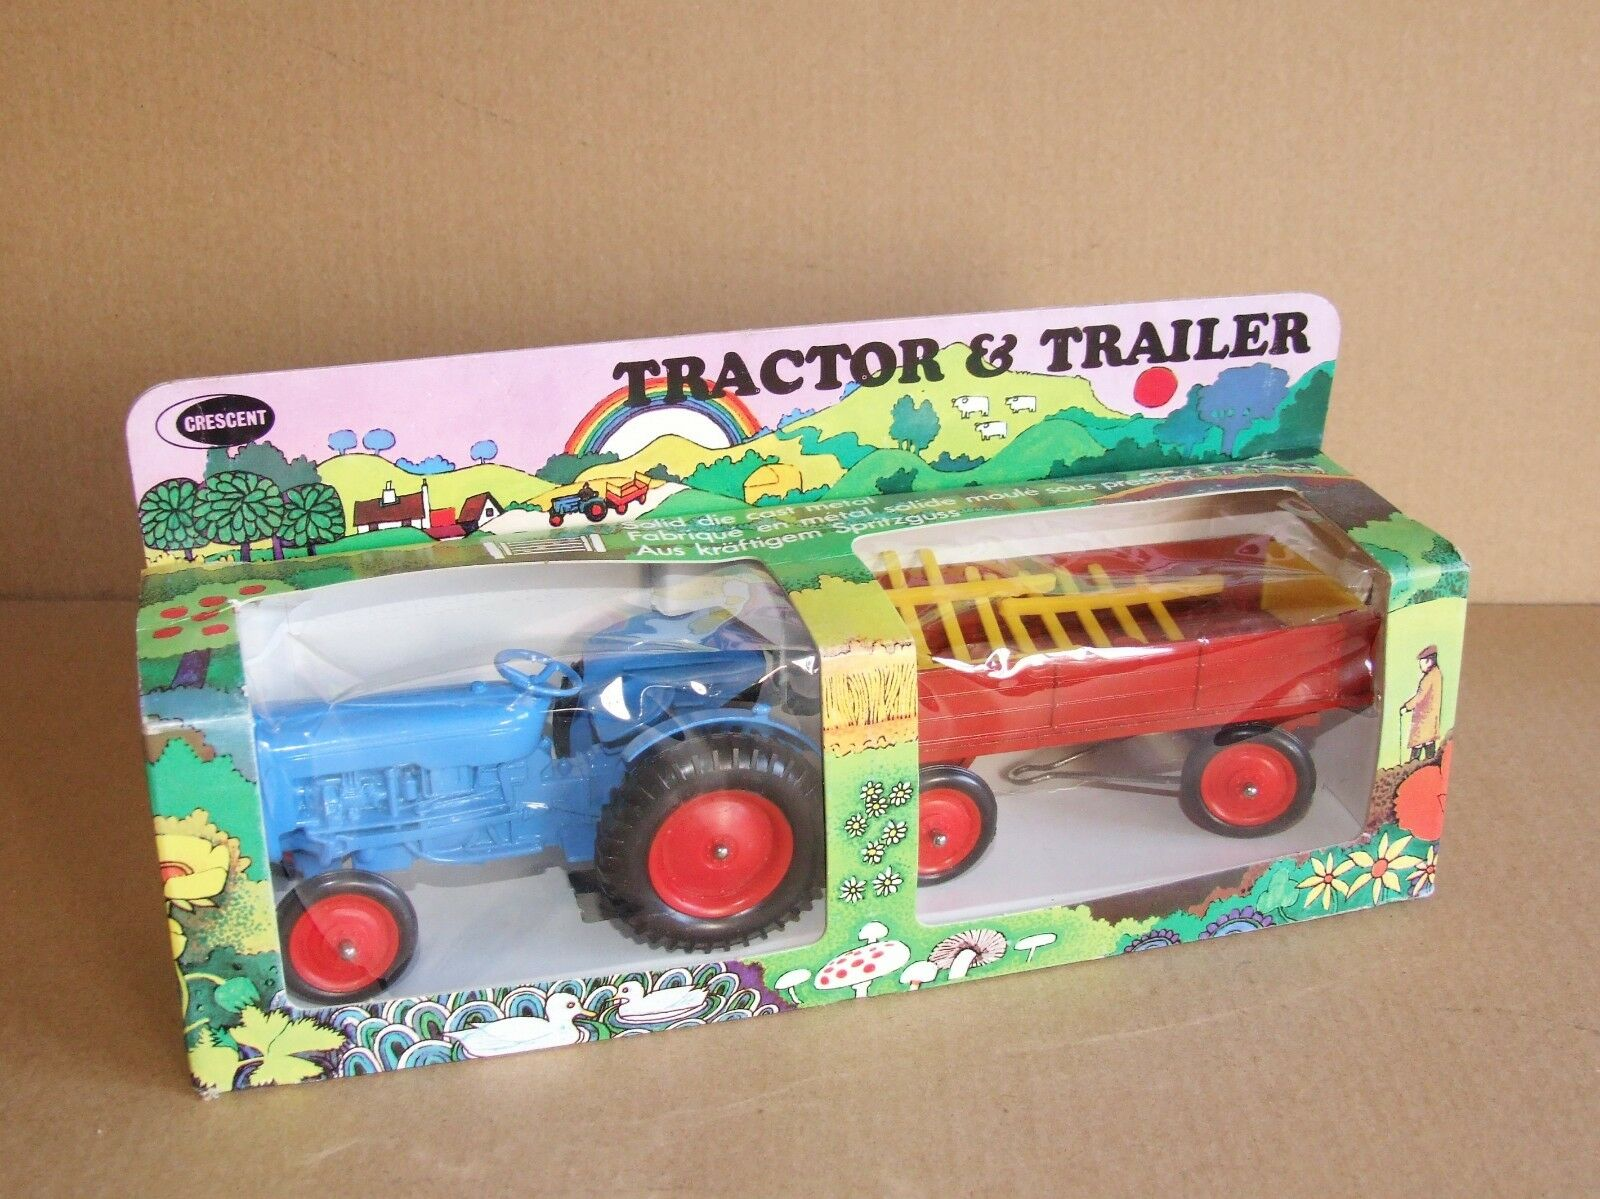 Crescent 1811 Ford Dexta Tractor & Trailer Set - Very RARE       B